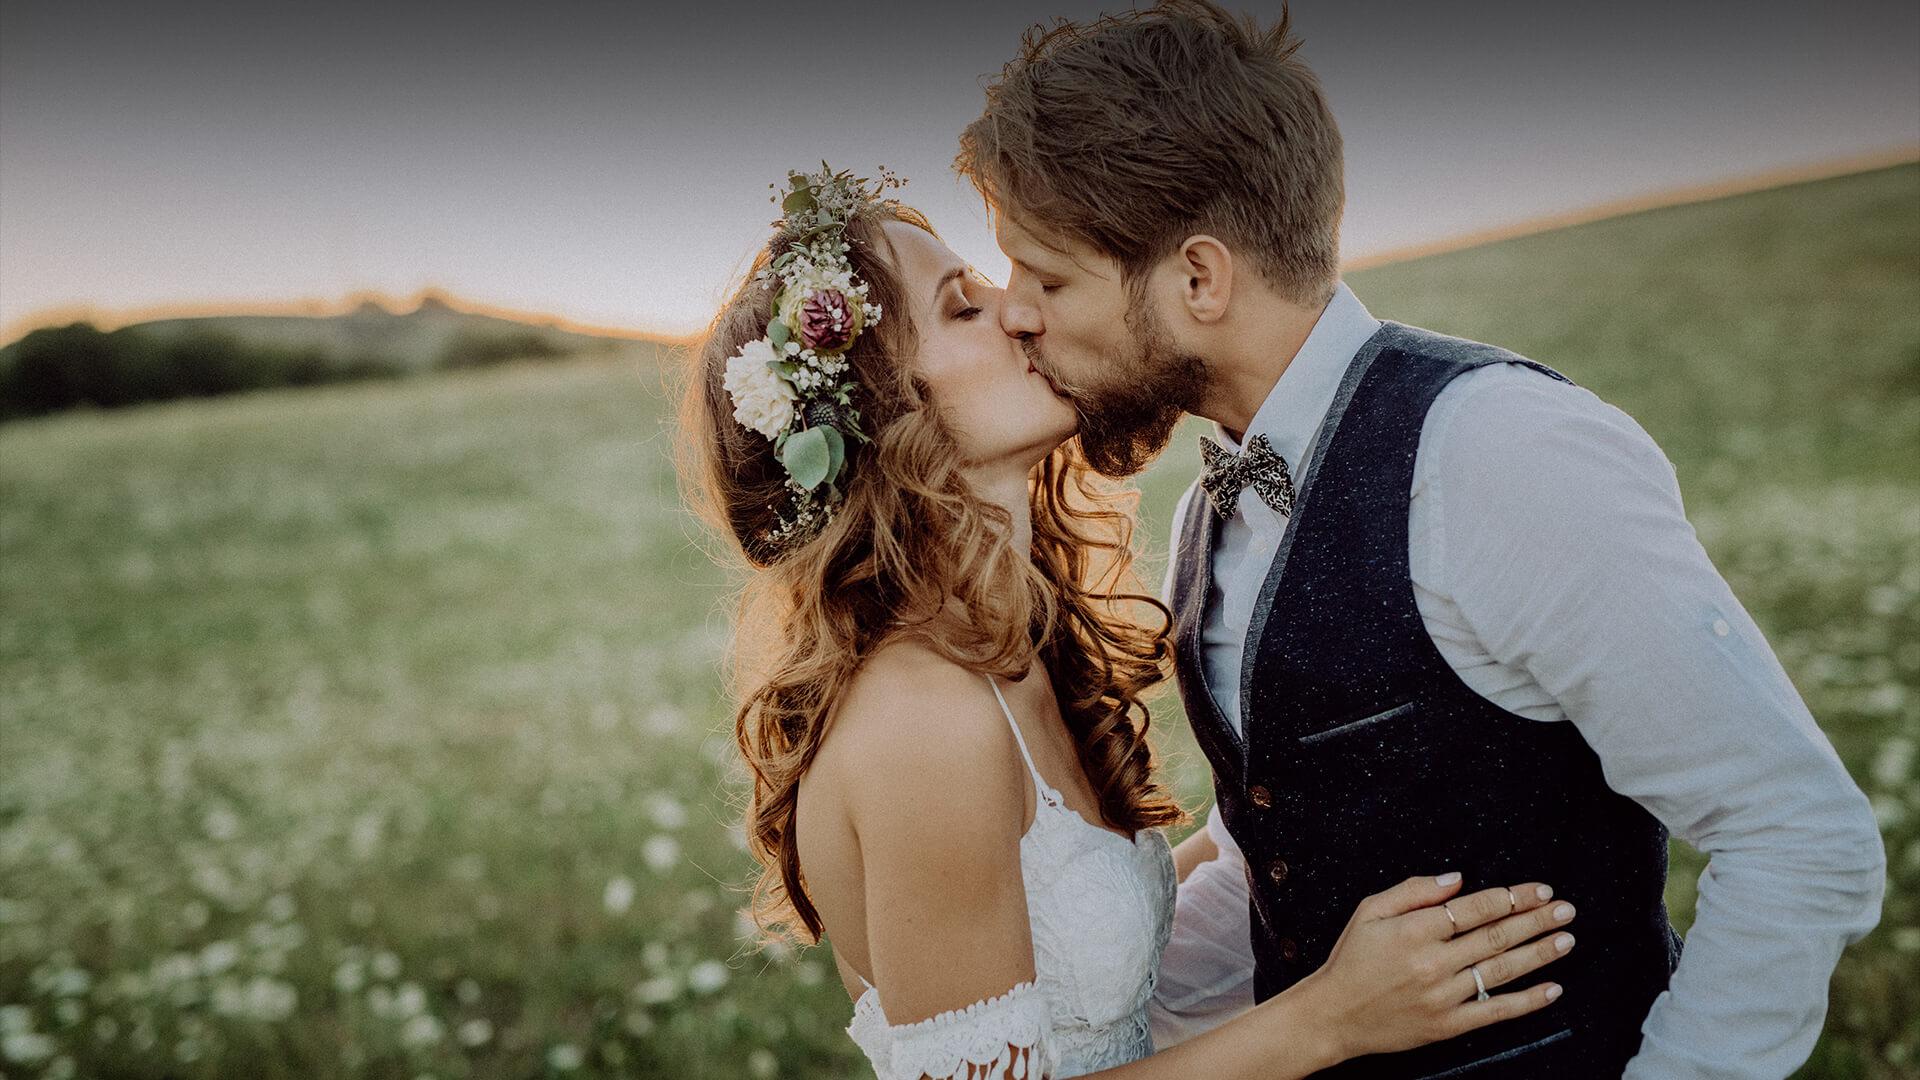 Love and Marriage - Shauna Rowe Celebrant